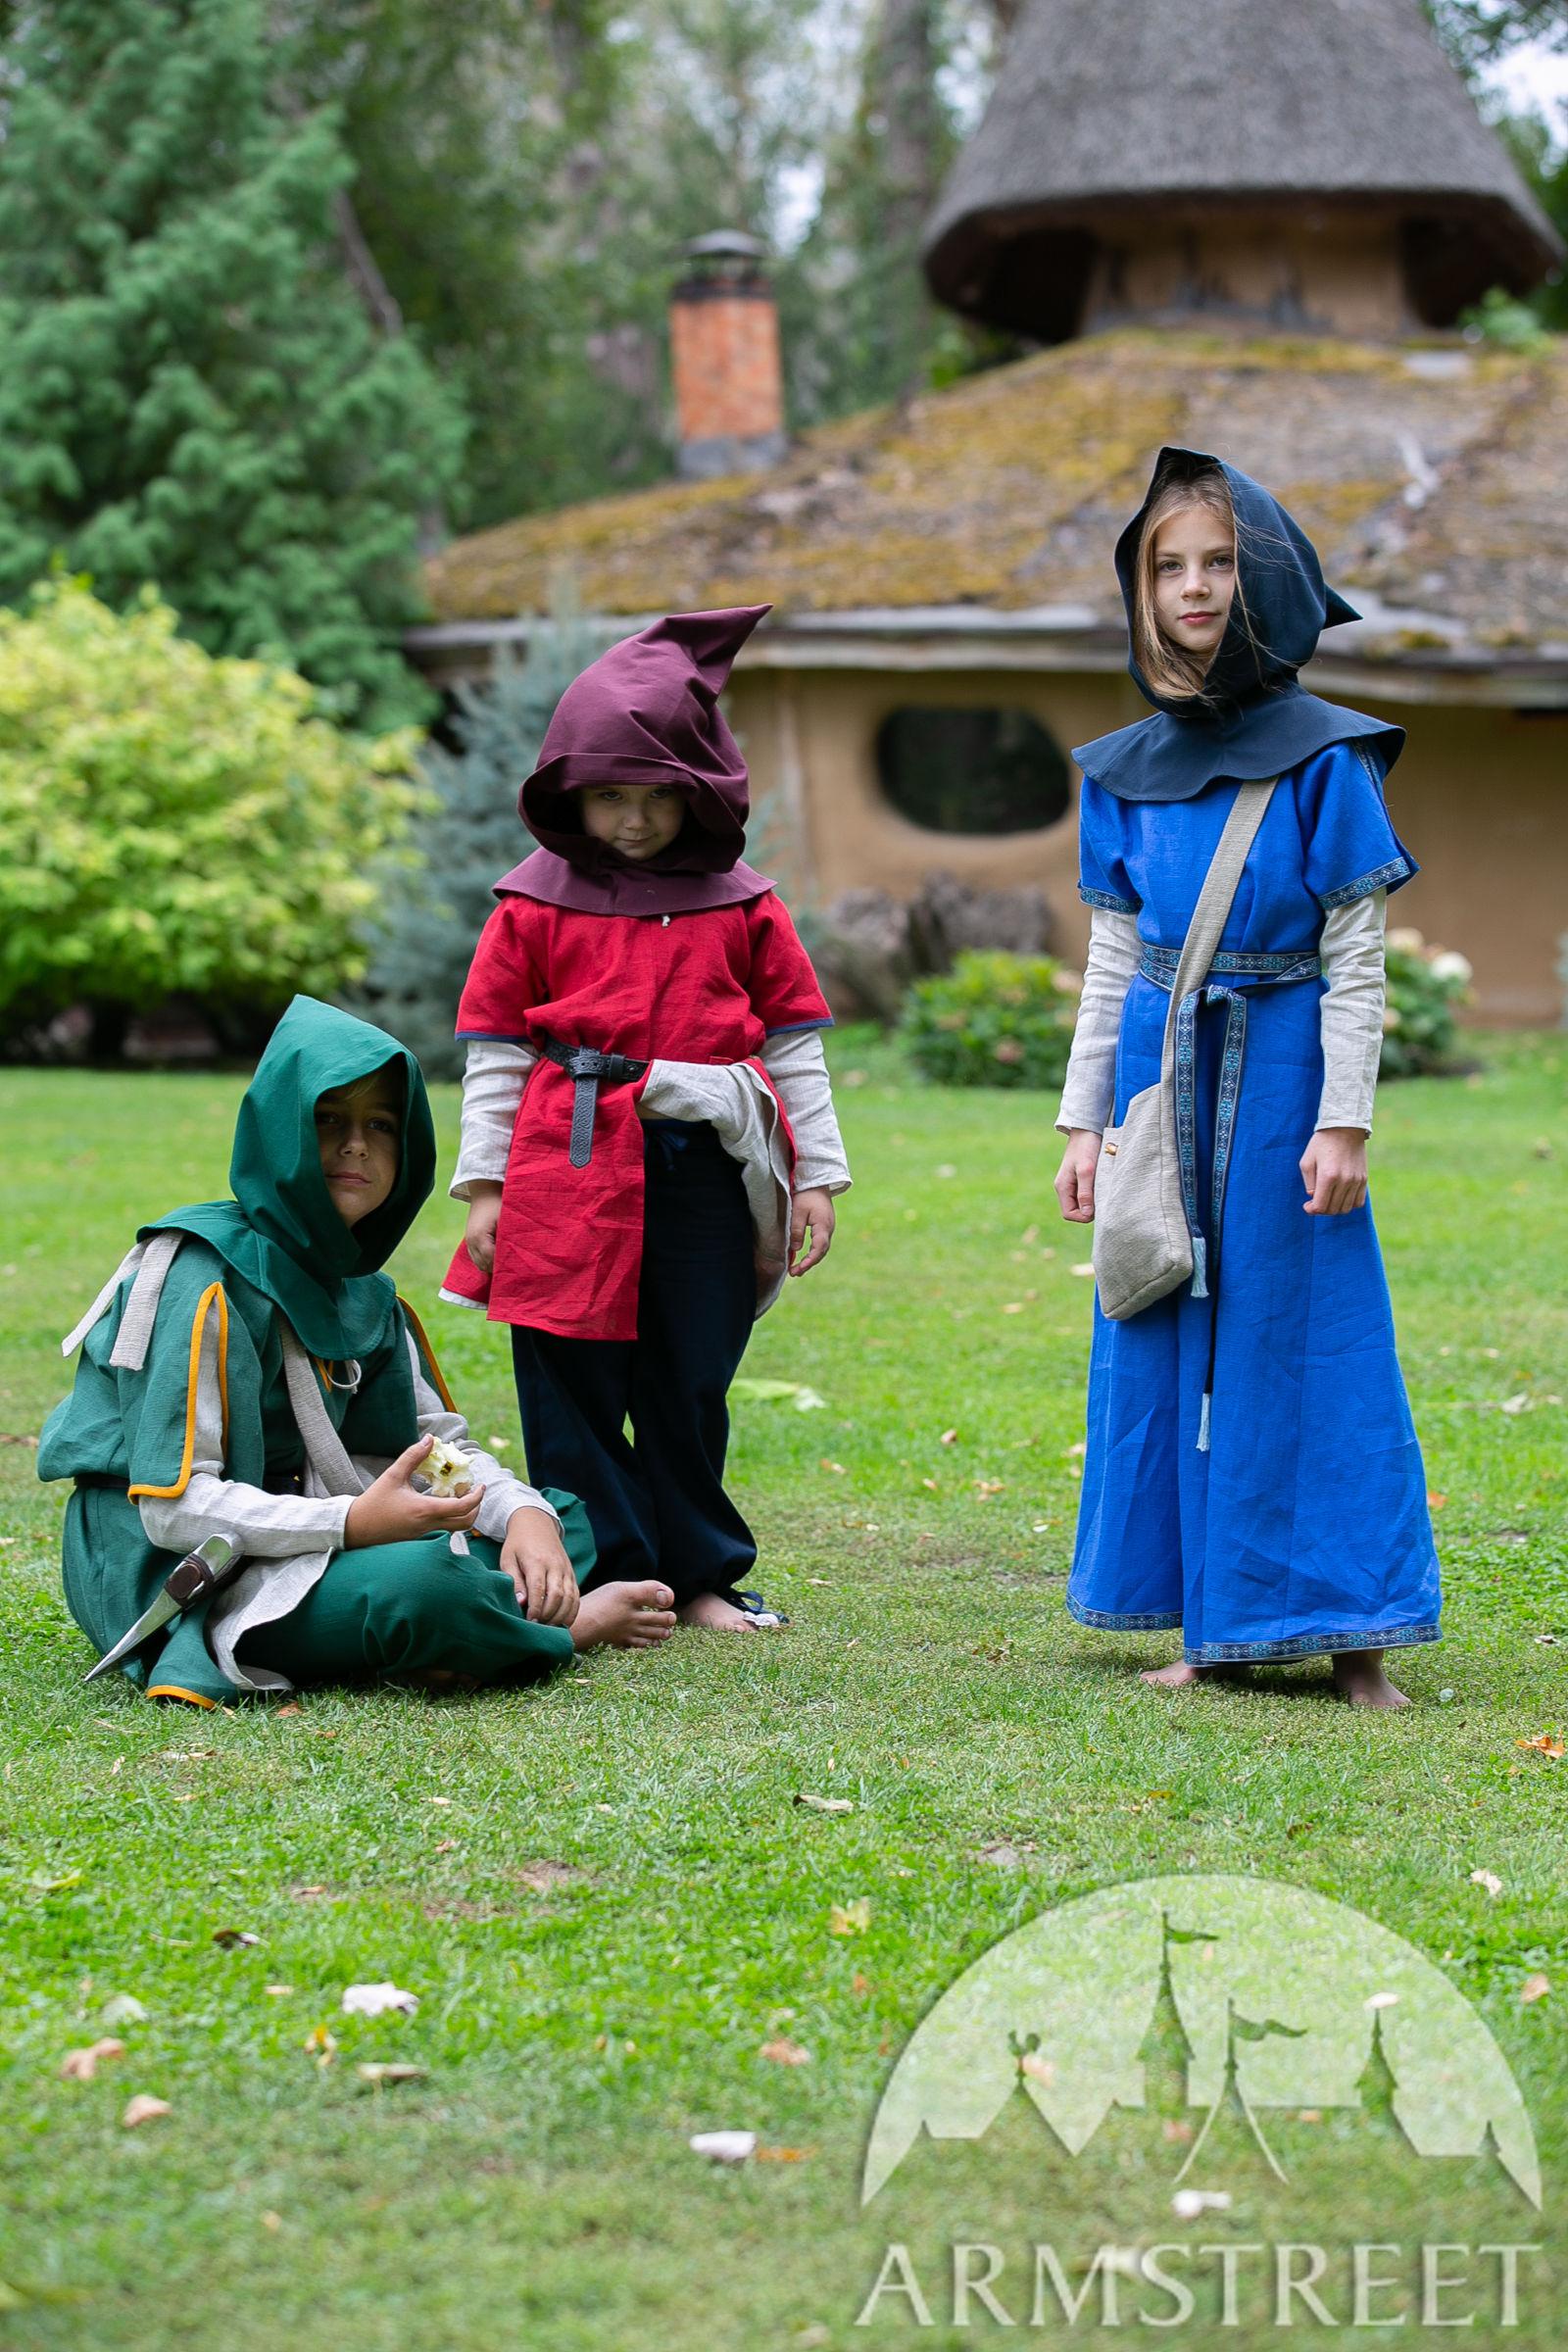 https://armstreet.com/catalogue/full/cotton-hood-for-kids-first-adventure-childrens-chaperon.jpg